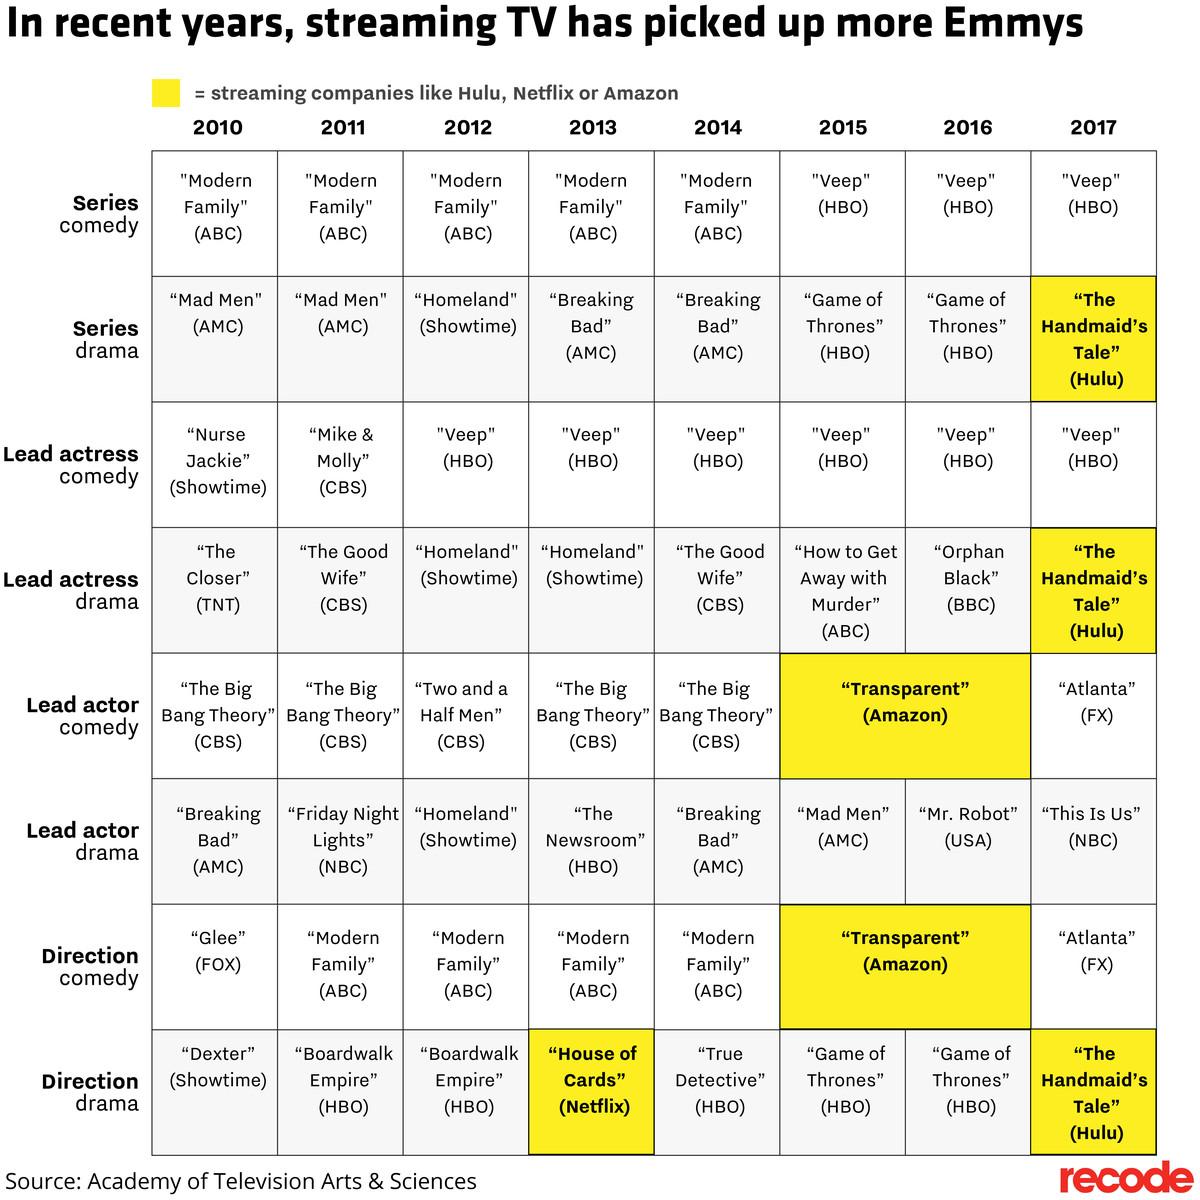 Chart of top Emmy winners since 2010